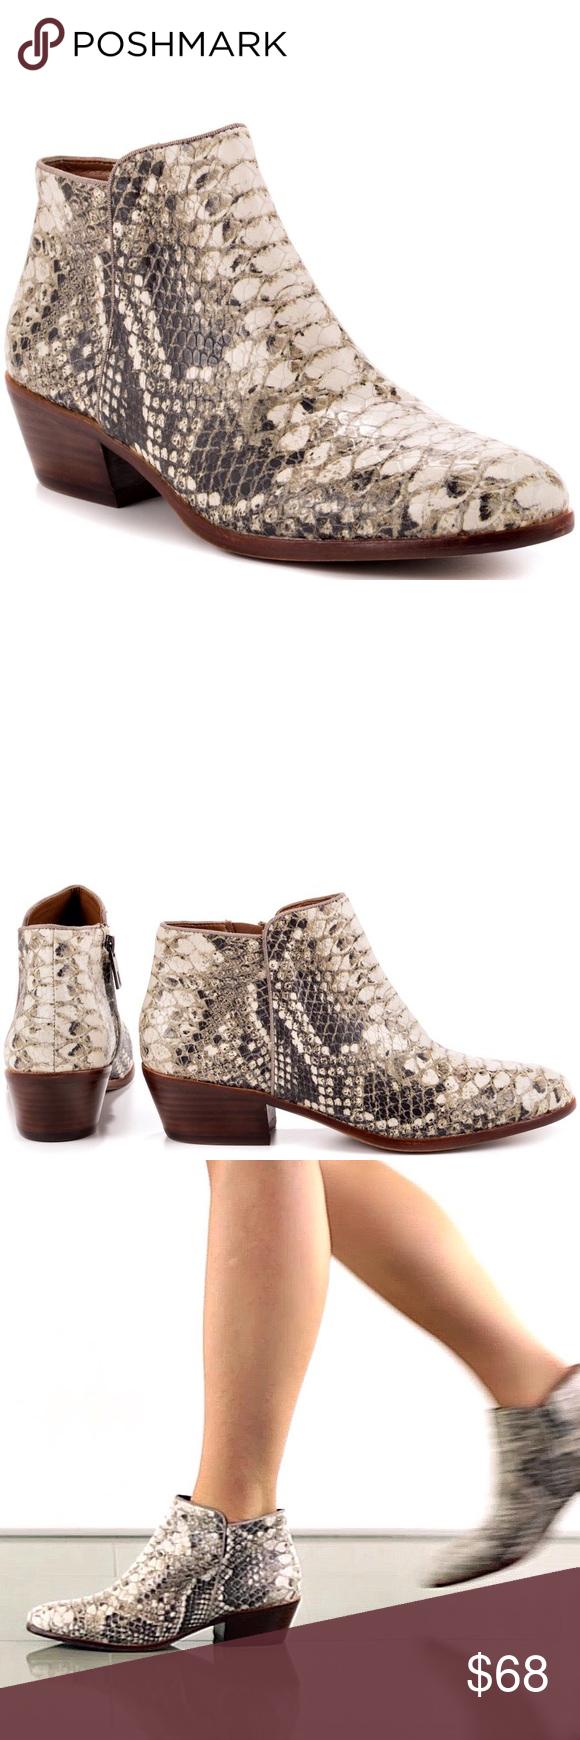 e176501392ae7 Sam Edelman Petty Roccia Python Snakeskin Booties Ultra Rare Roccia Python  print Petty ankle boots